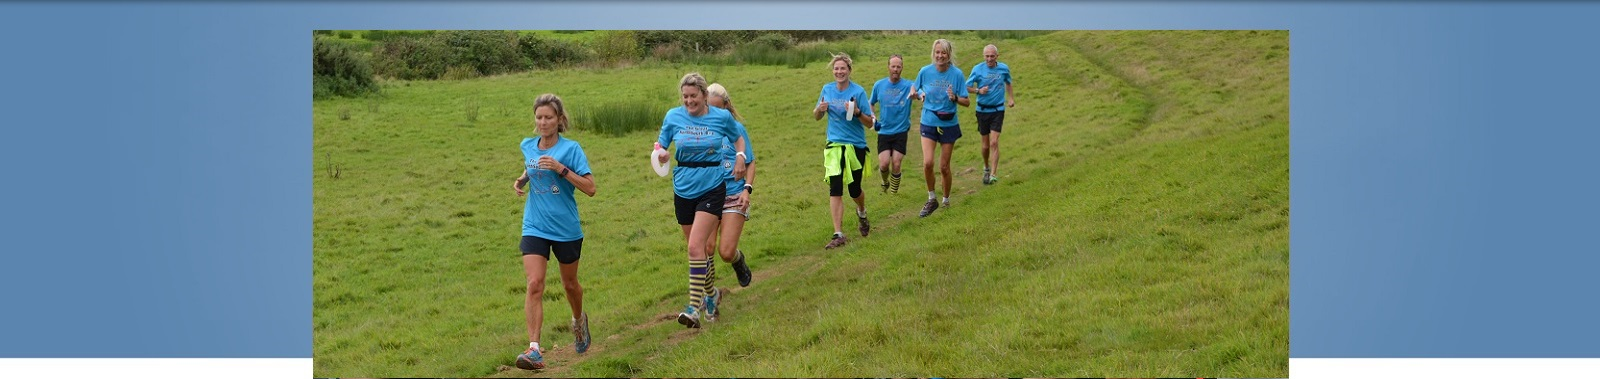 Great-North-Run-2016